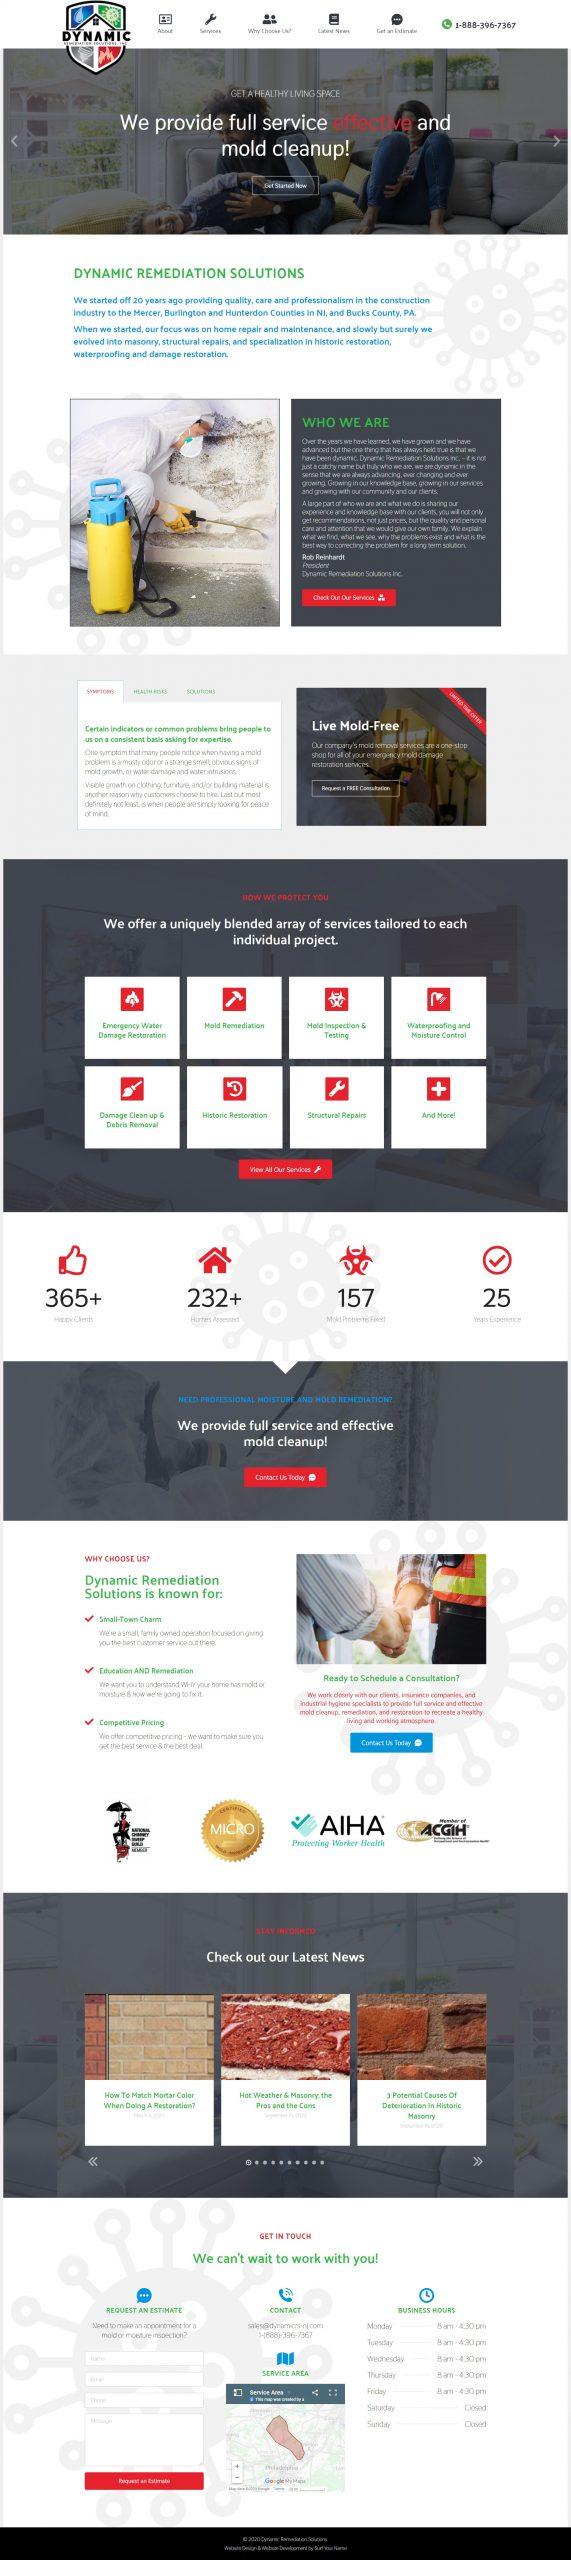 Surf Your Name - Virginia Web Design - Custom WordPress Website - WordPress Website - Web Design